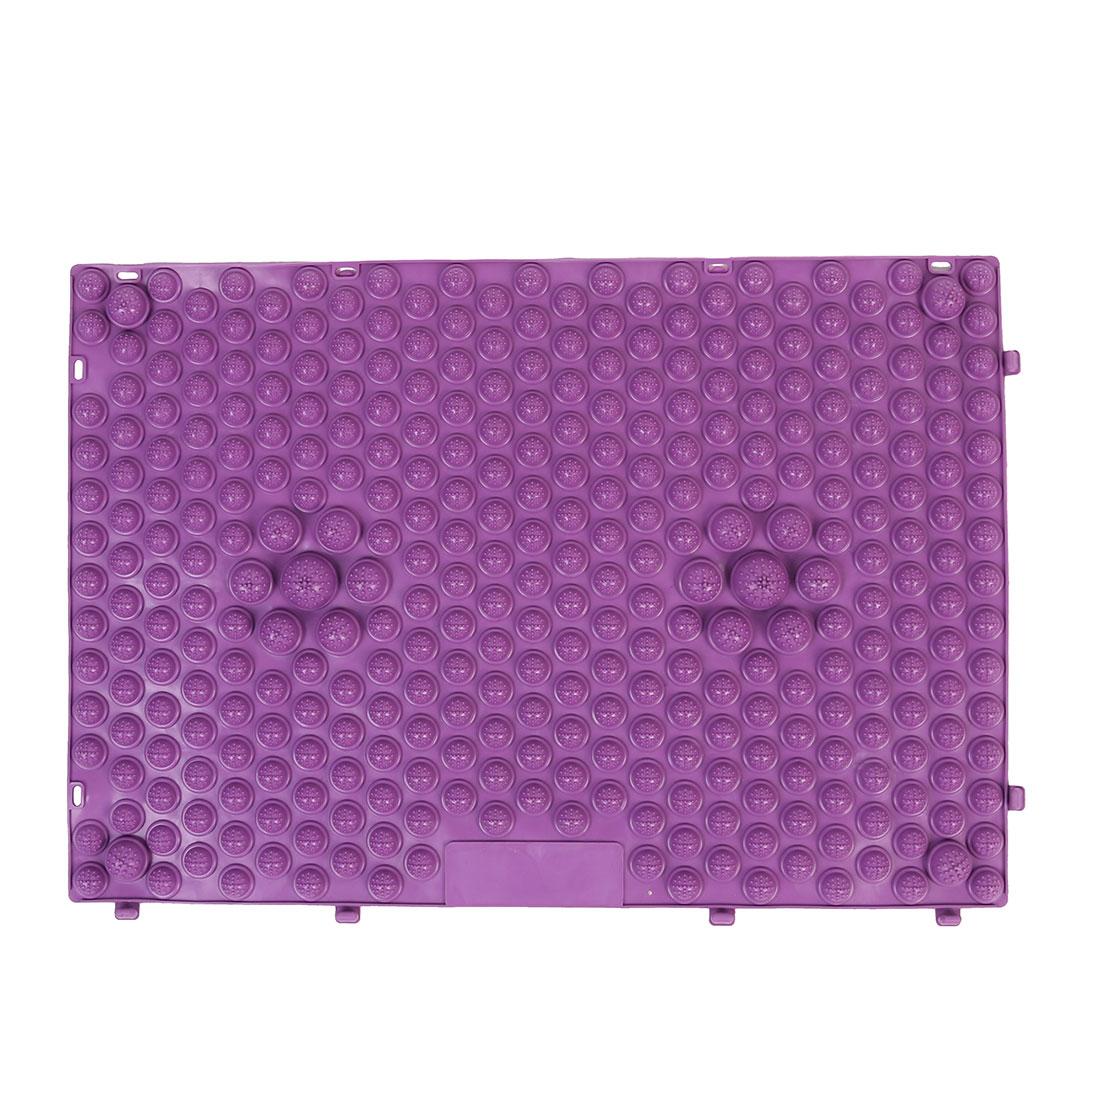 Outdoor Leisure Game Rubber Acupuncture Foot Massage Mat Shiatsu Sheet Purple